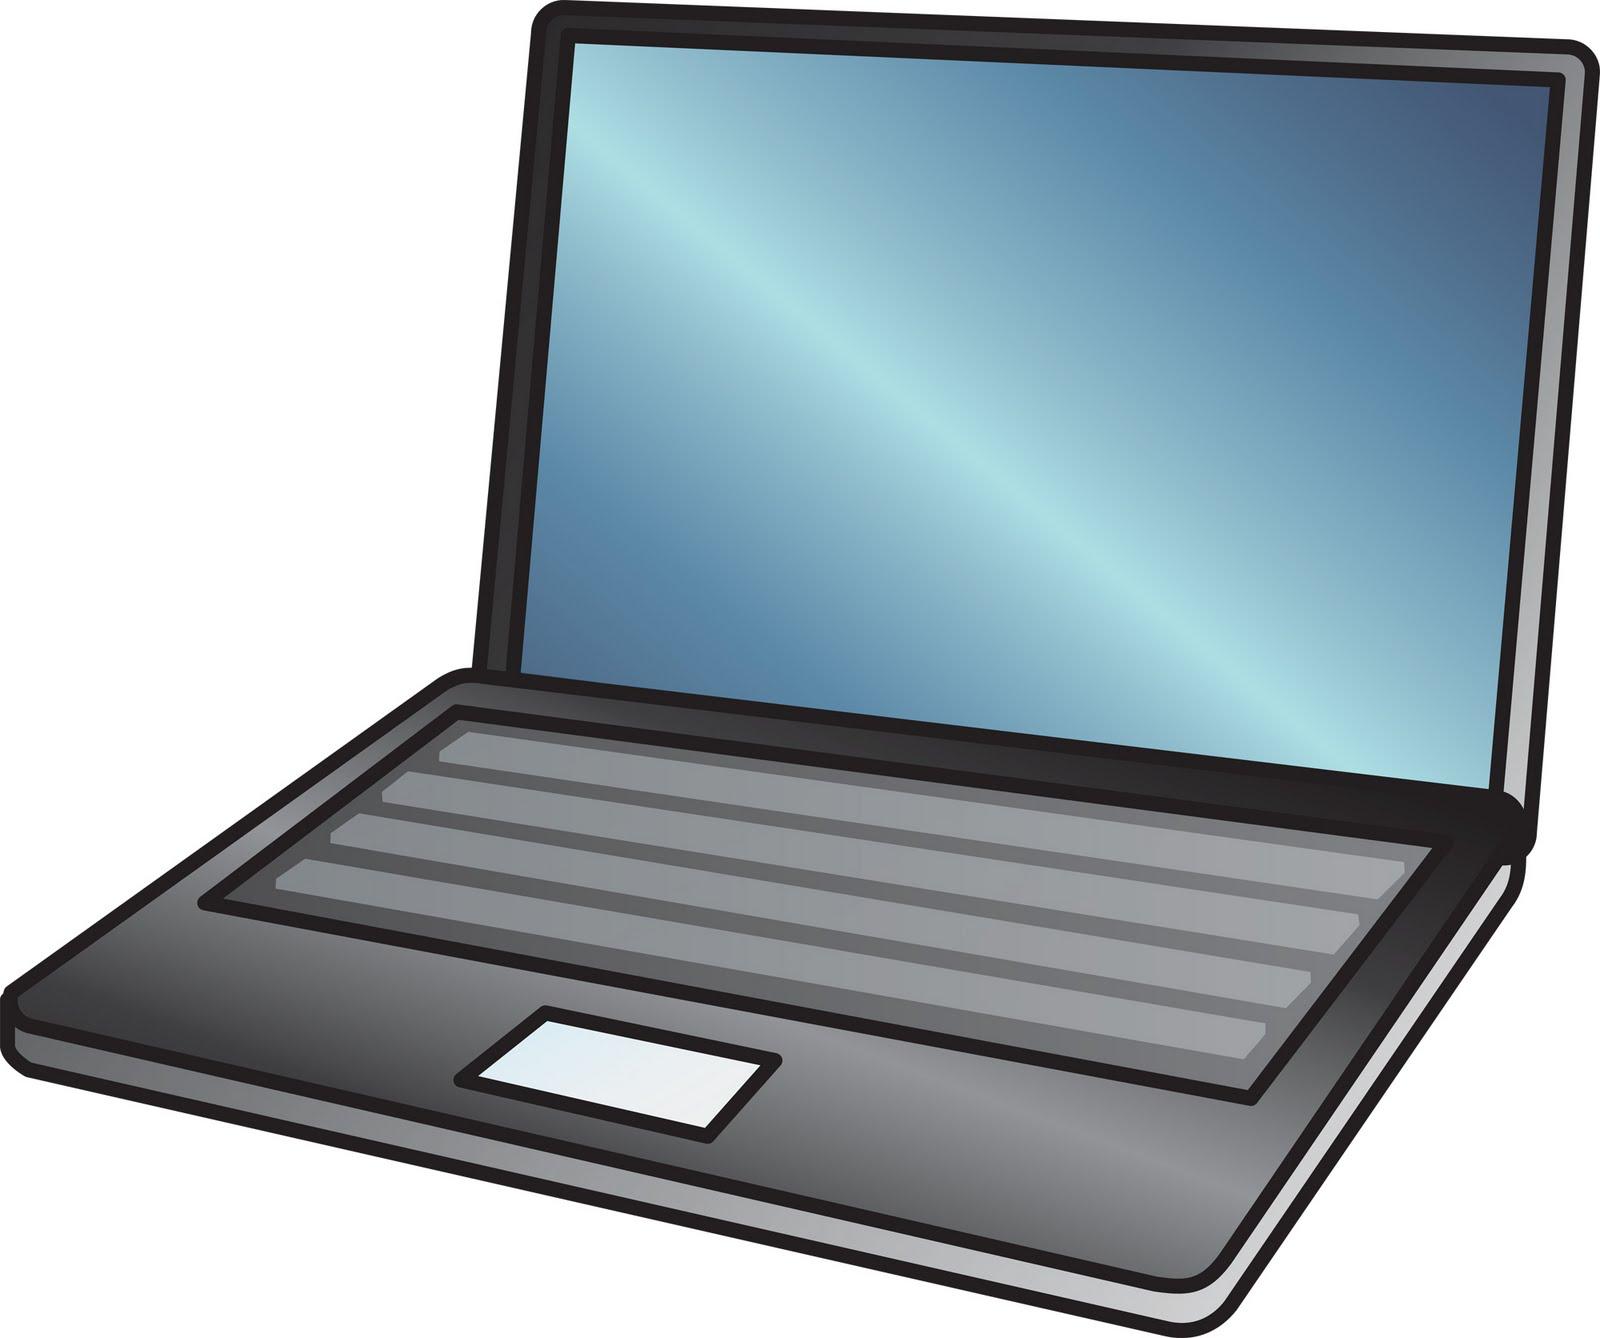 Laptop Computer Clipart Clipart Panda Fr-Laptop Computer Clipart Clipart Panda Free Clipart Images-15